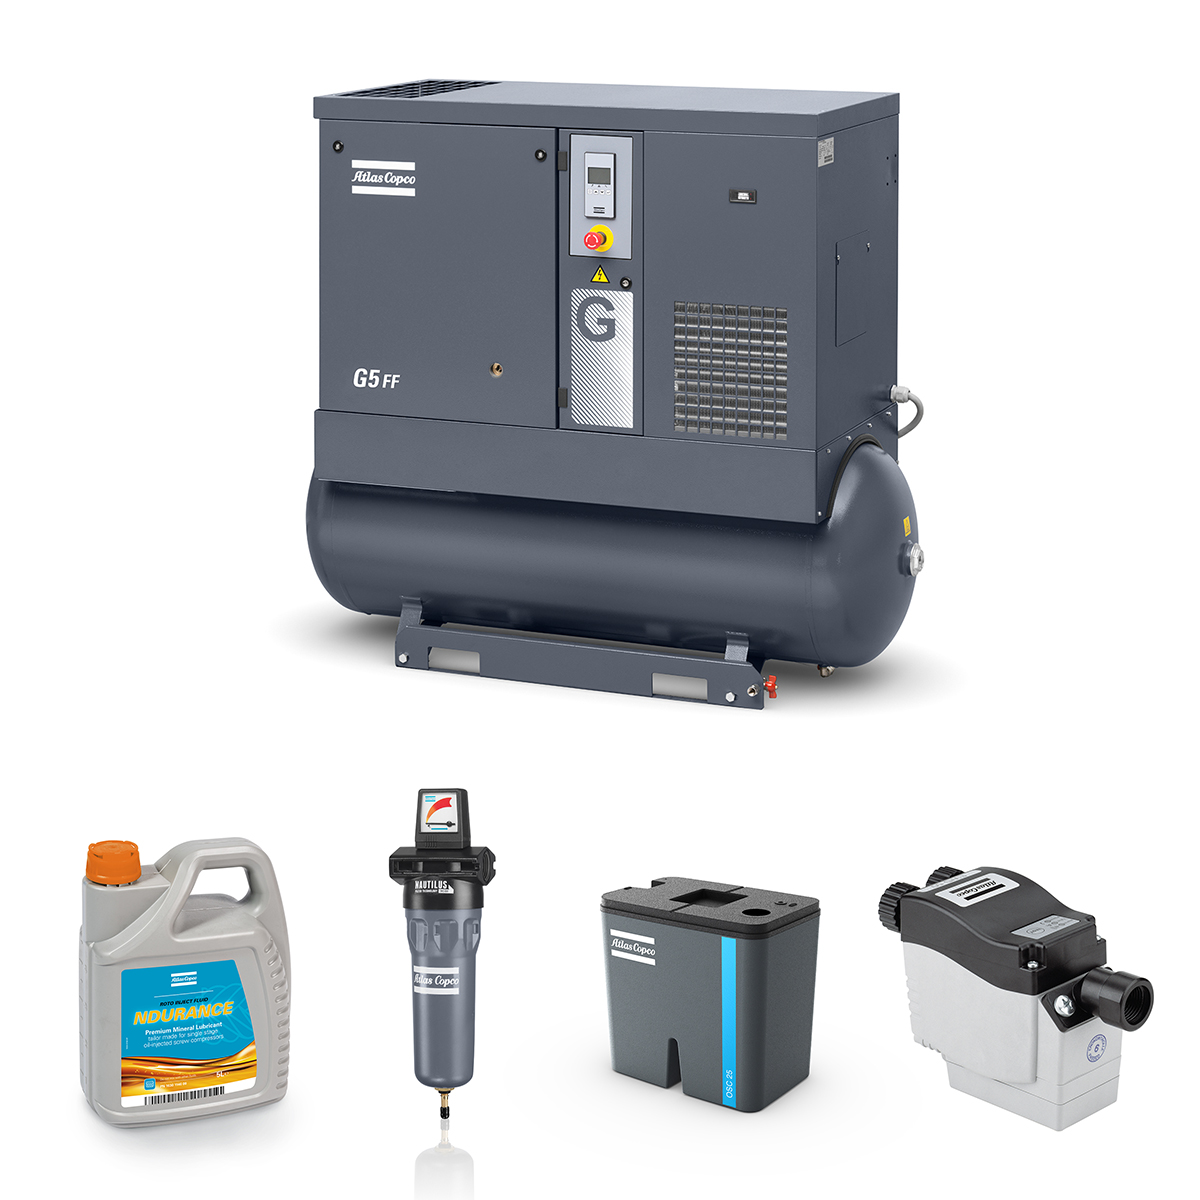 5kW Screw Compressed Air Bundle: Compressor, Separator, Filter, Drain, Oil